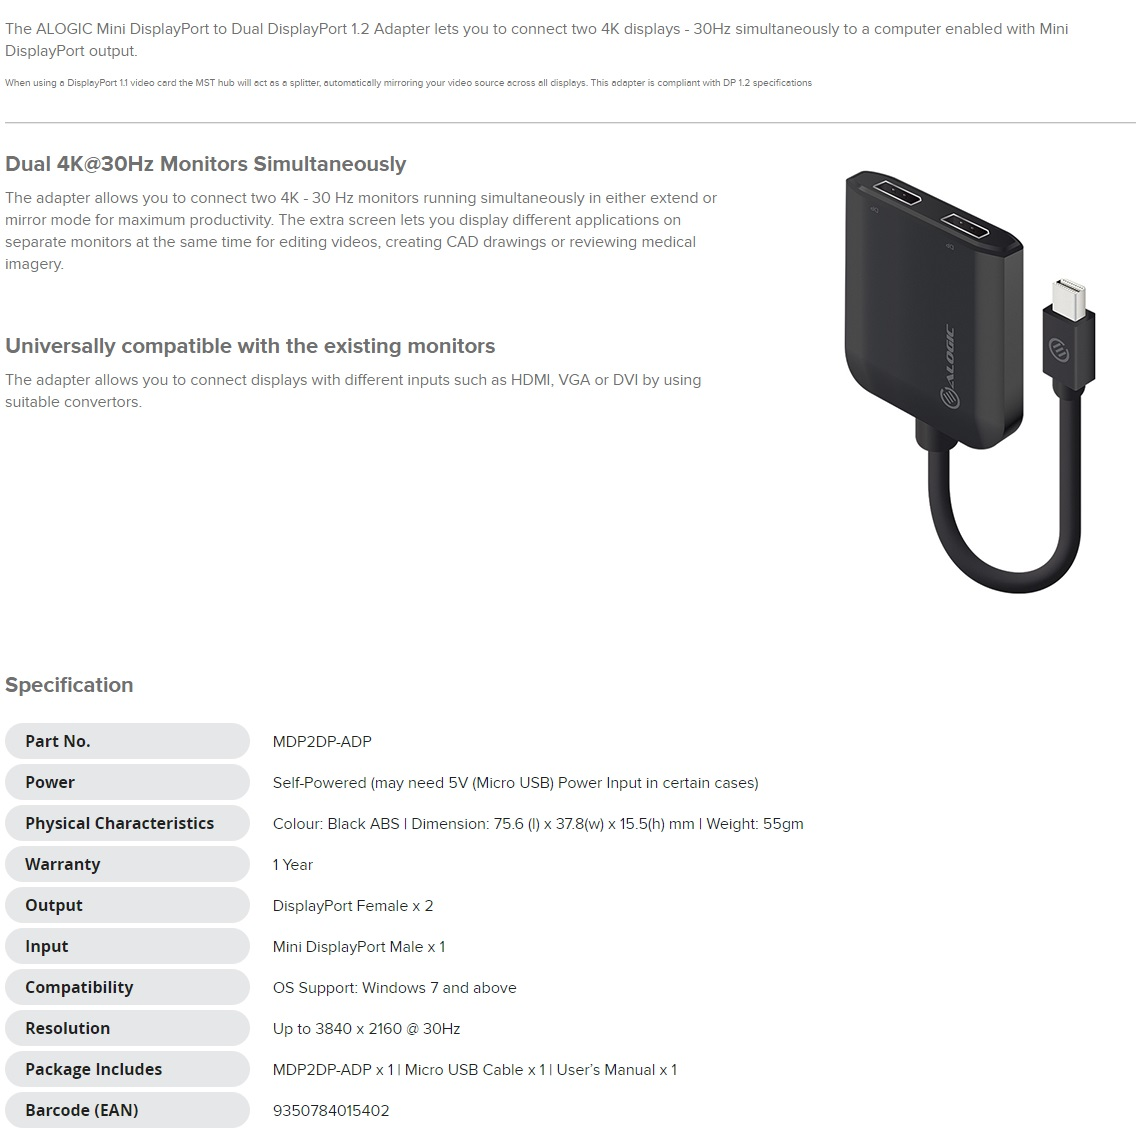 Alogic Mini DisplayPort to Dual DisplayPort 1.2 Adapter - 4K - 30 Hz MDP2DP-ADP